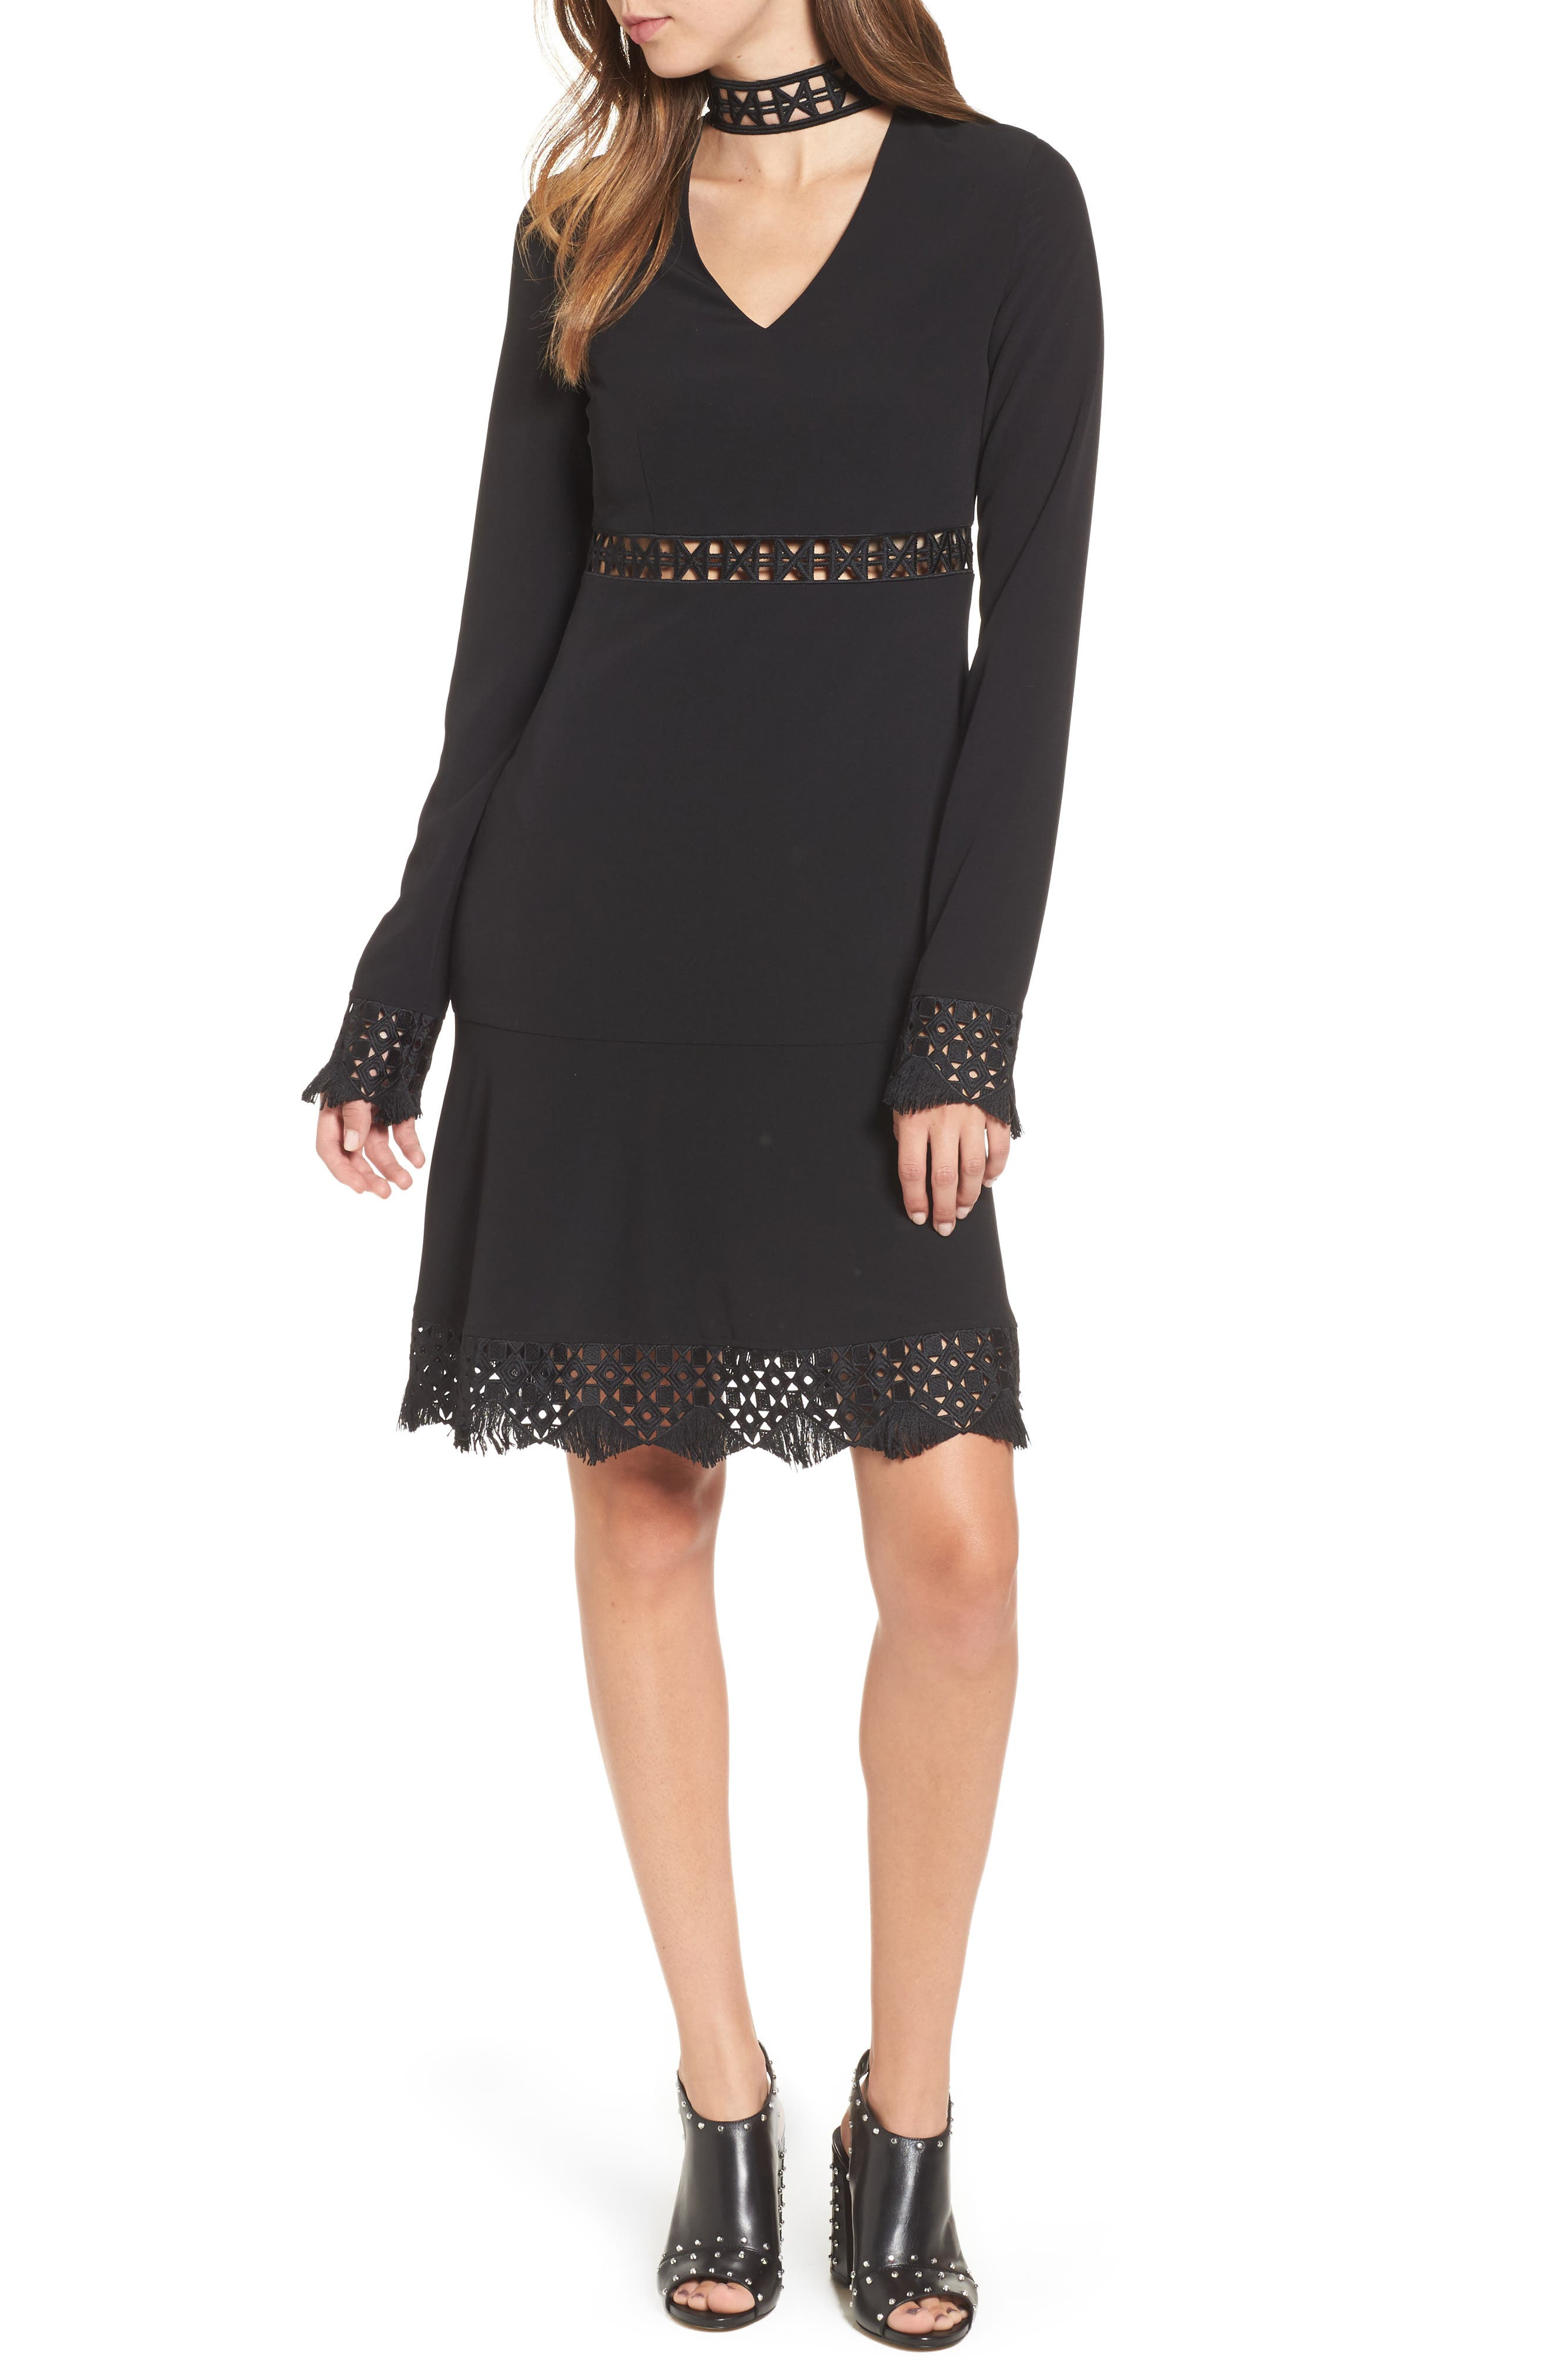 Alternate Image 1 Selected - SuperTrash Dacy Choker Dress